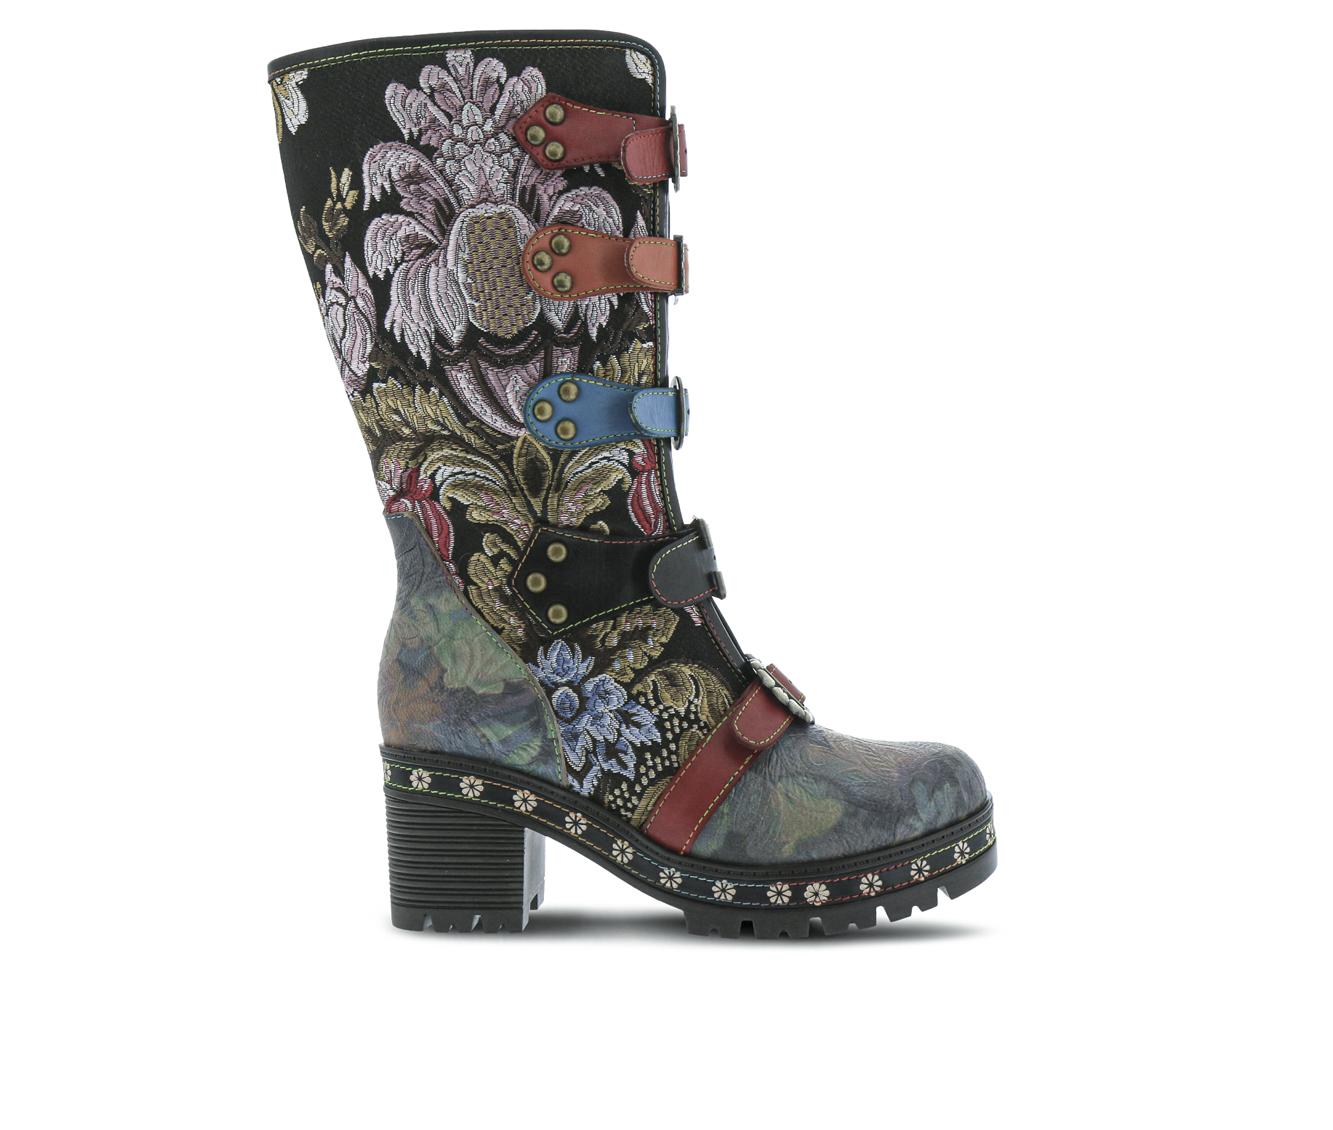 L'Artiste Brazen Women's Boots (Black Leather)